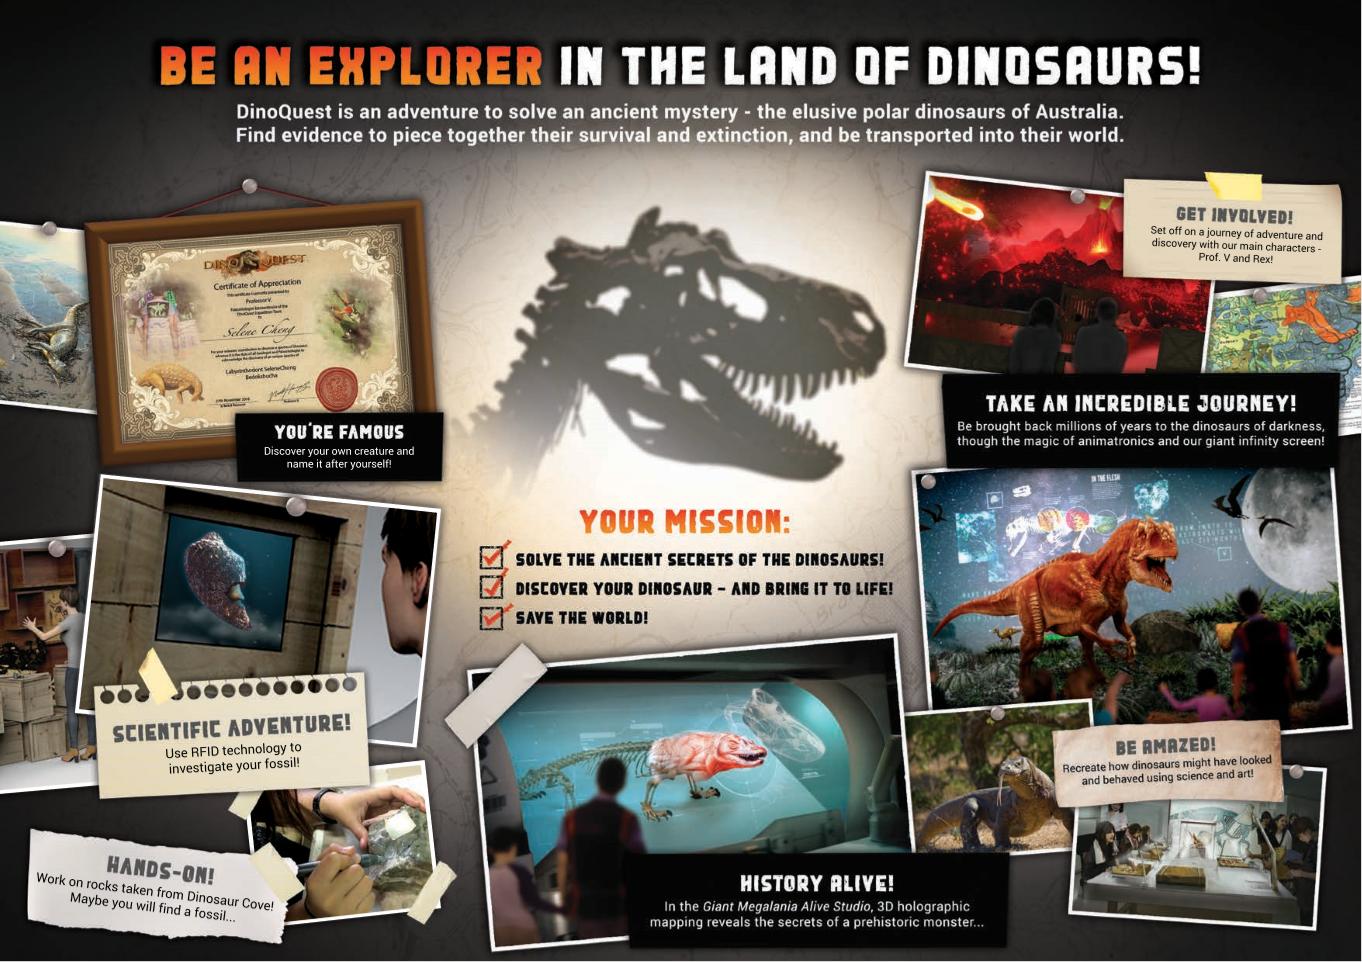 DinoQuest Mission